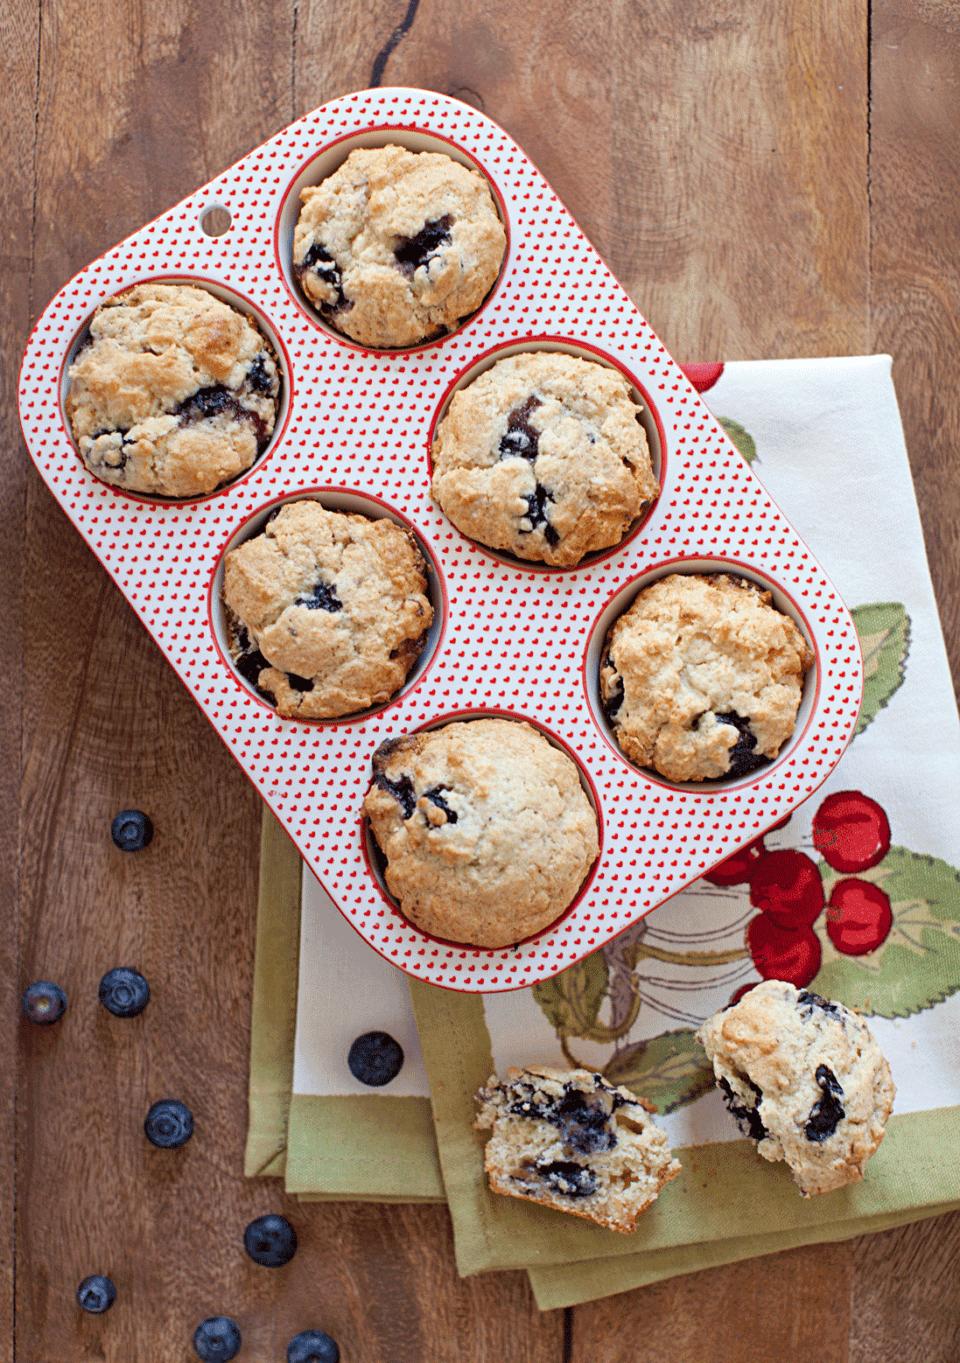 open-muffins-960x1363 Celebrate Creativity with a Stylish Midlothian, VA Blogger & DIYer